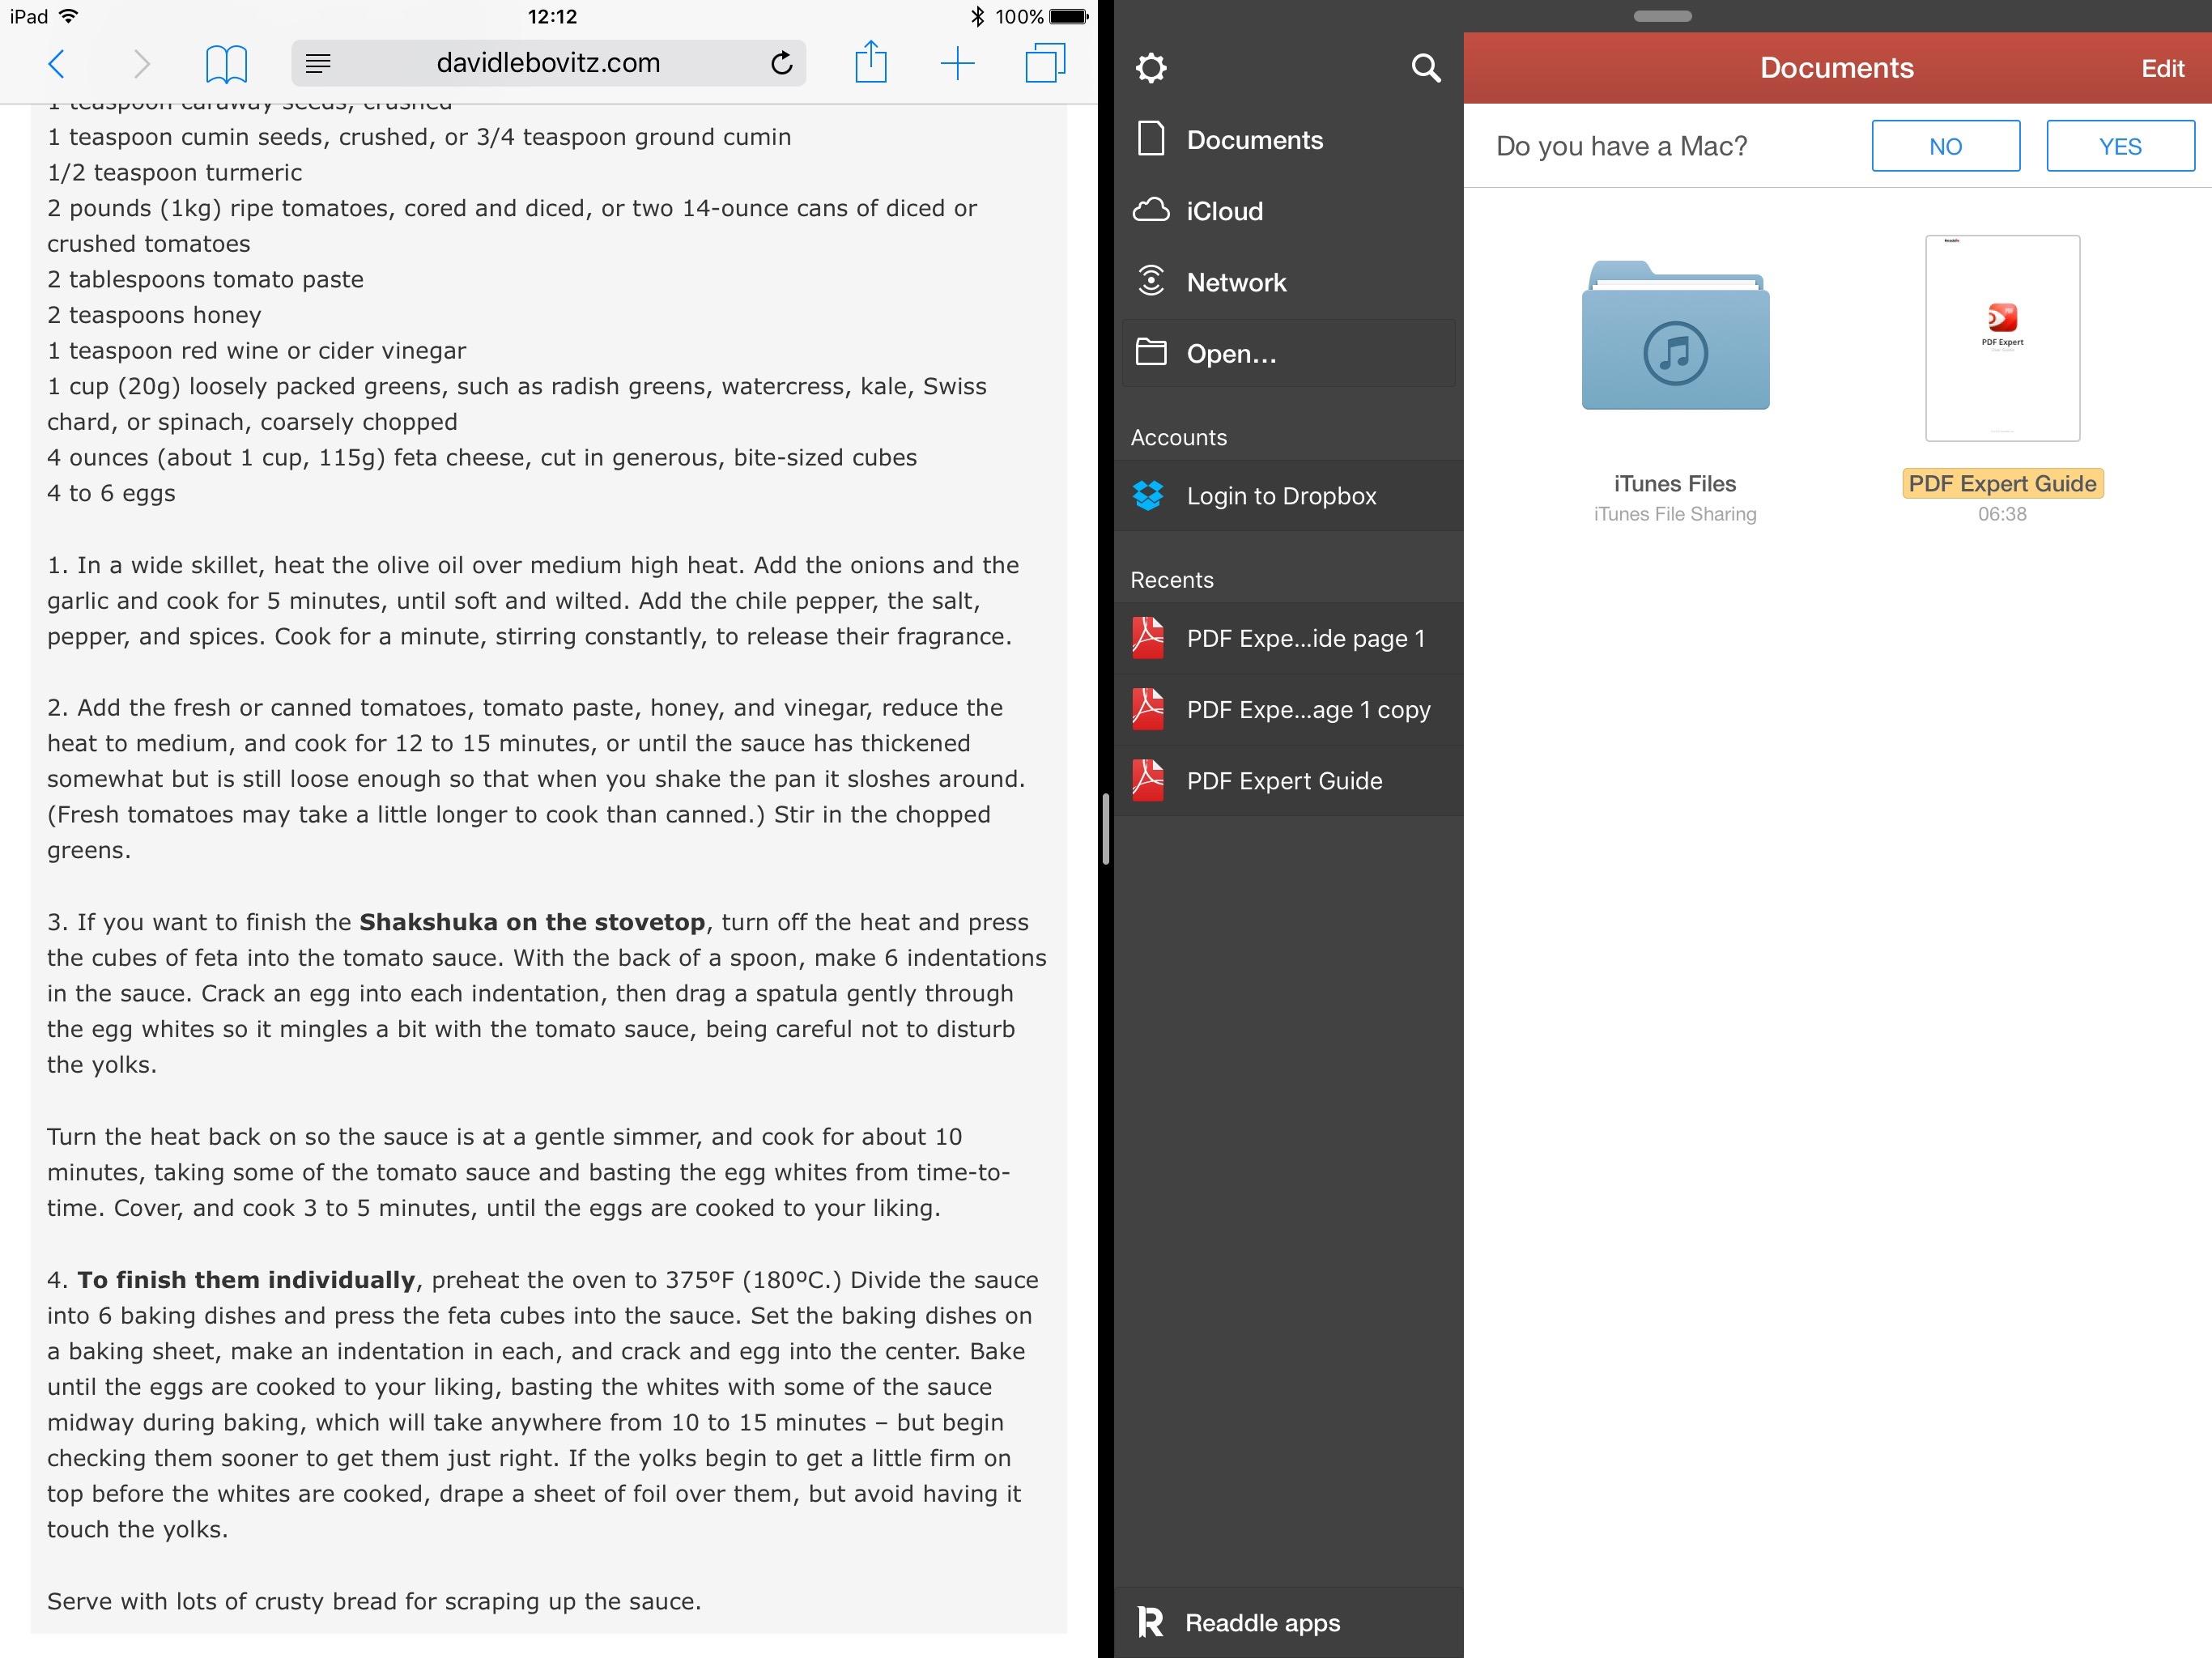 How to Use iPad Pro Split Screen: True iPad Multitasking